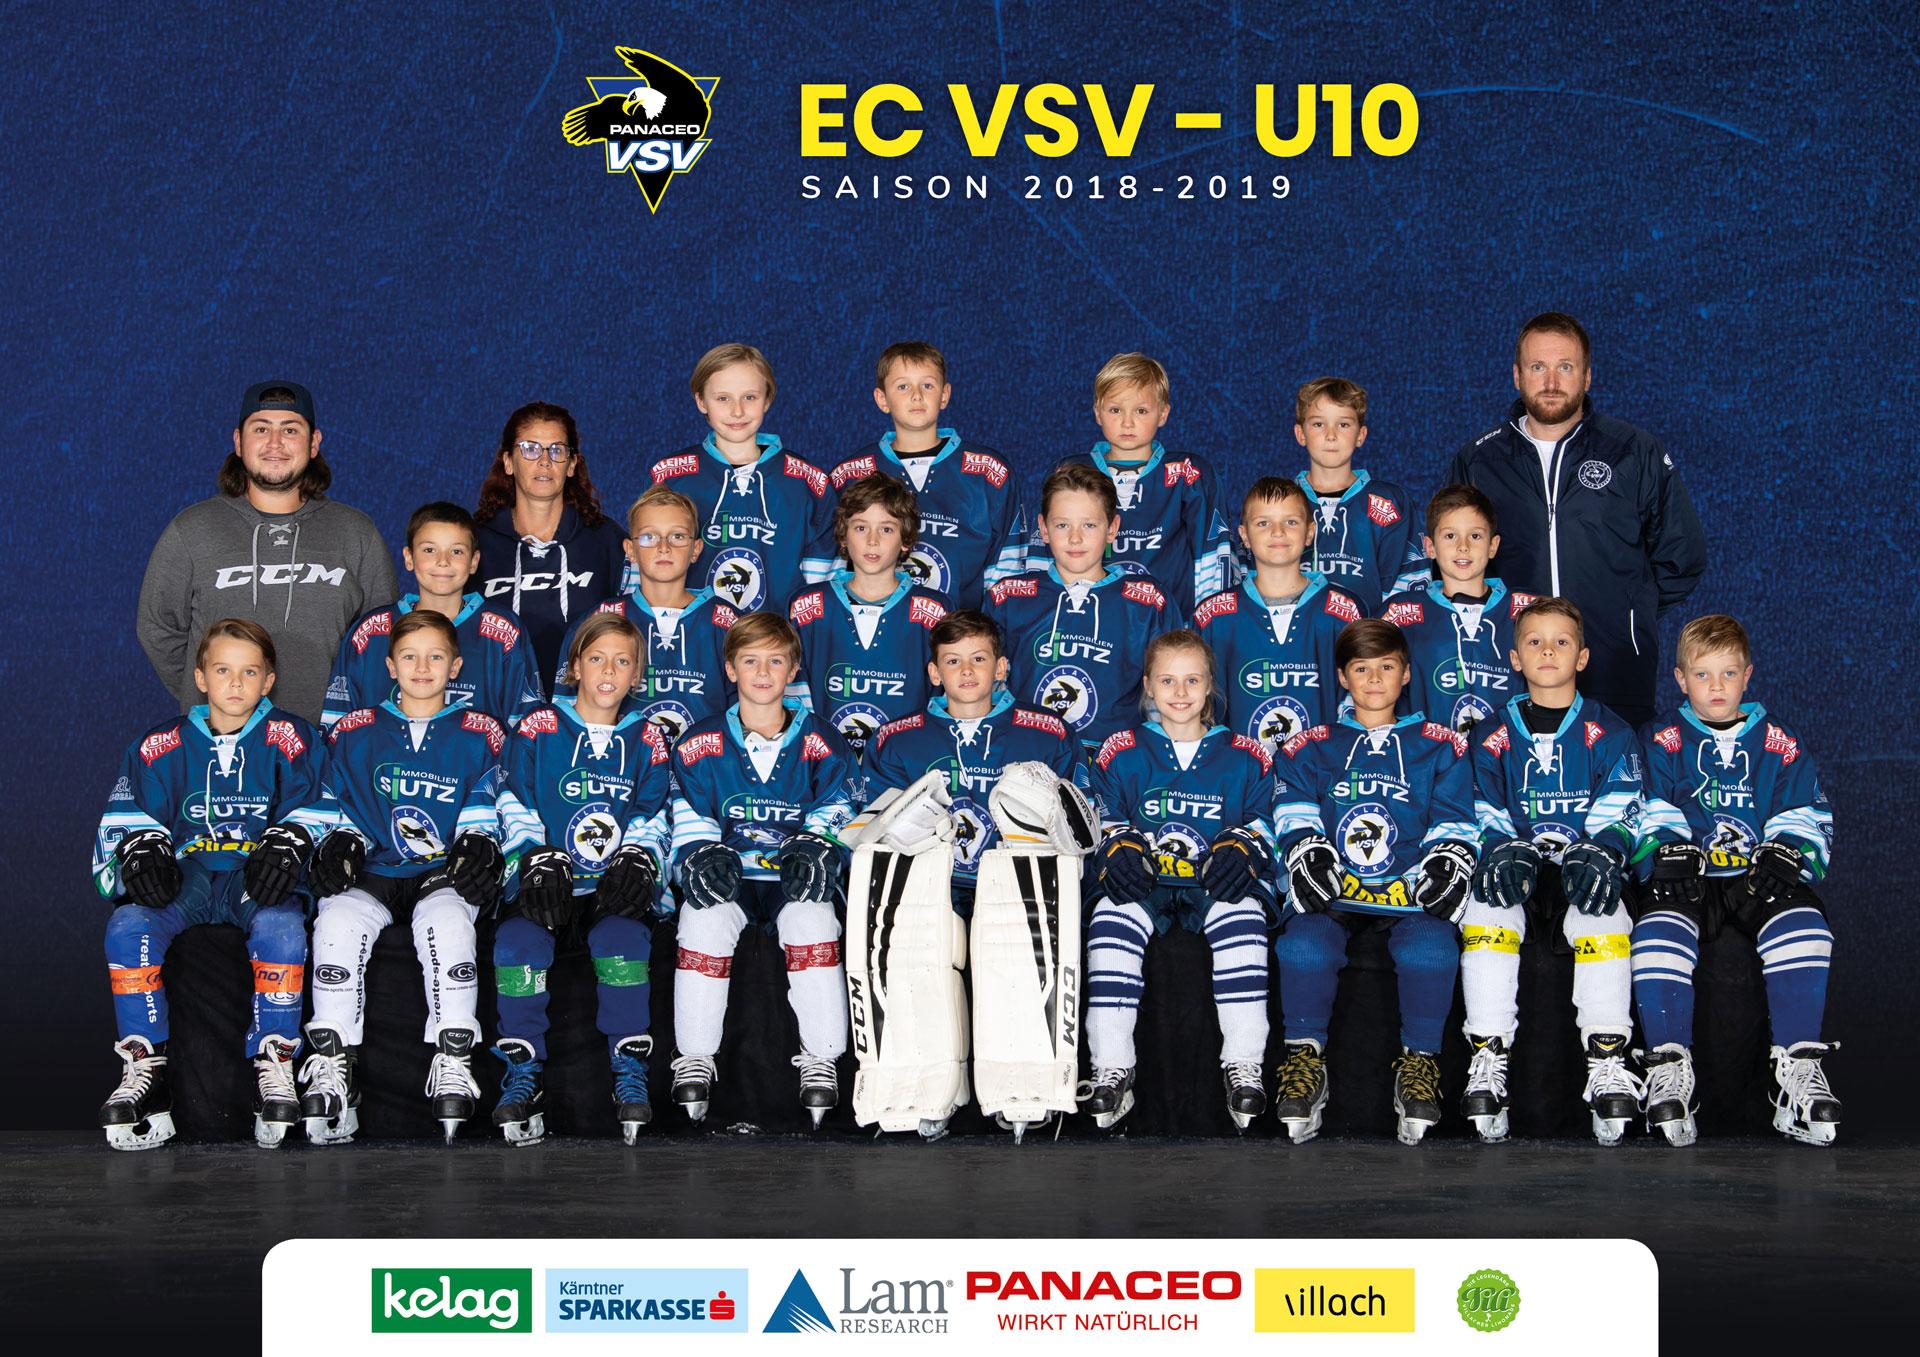 EC PANACEO VSV U10 2018-19